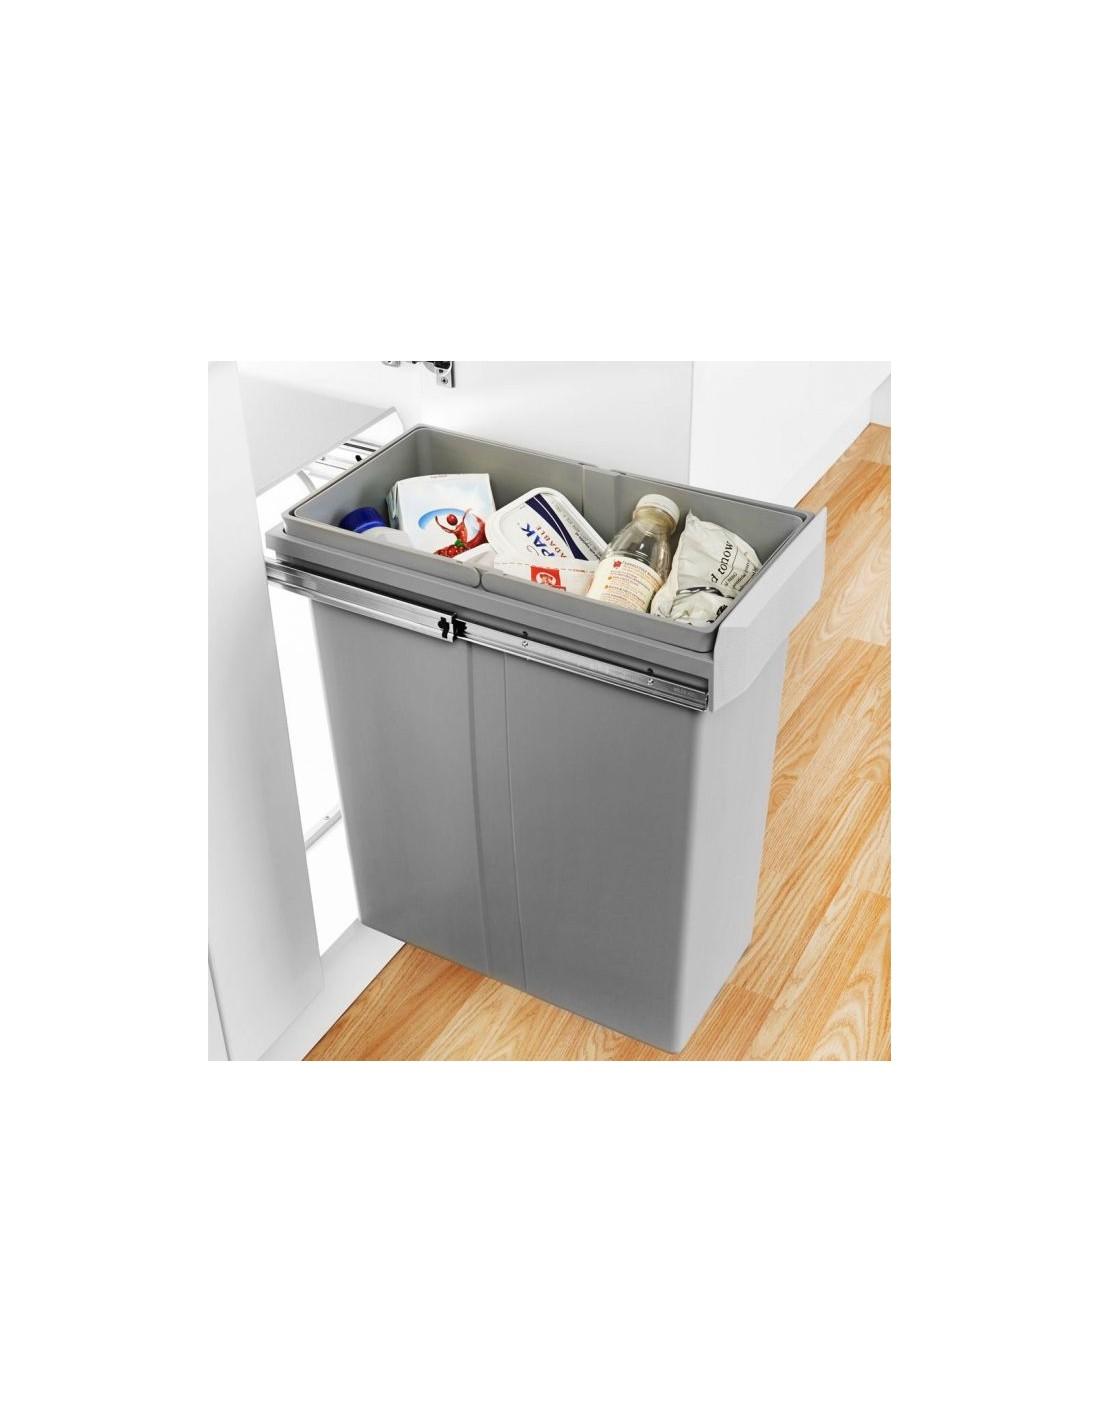 755640 85 wesco kitchen waste bin suits 300mm base kitchen unit single container